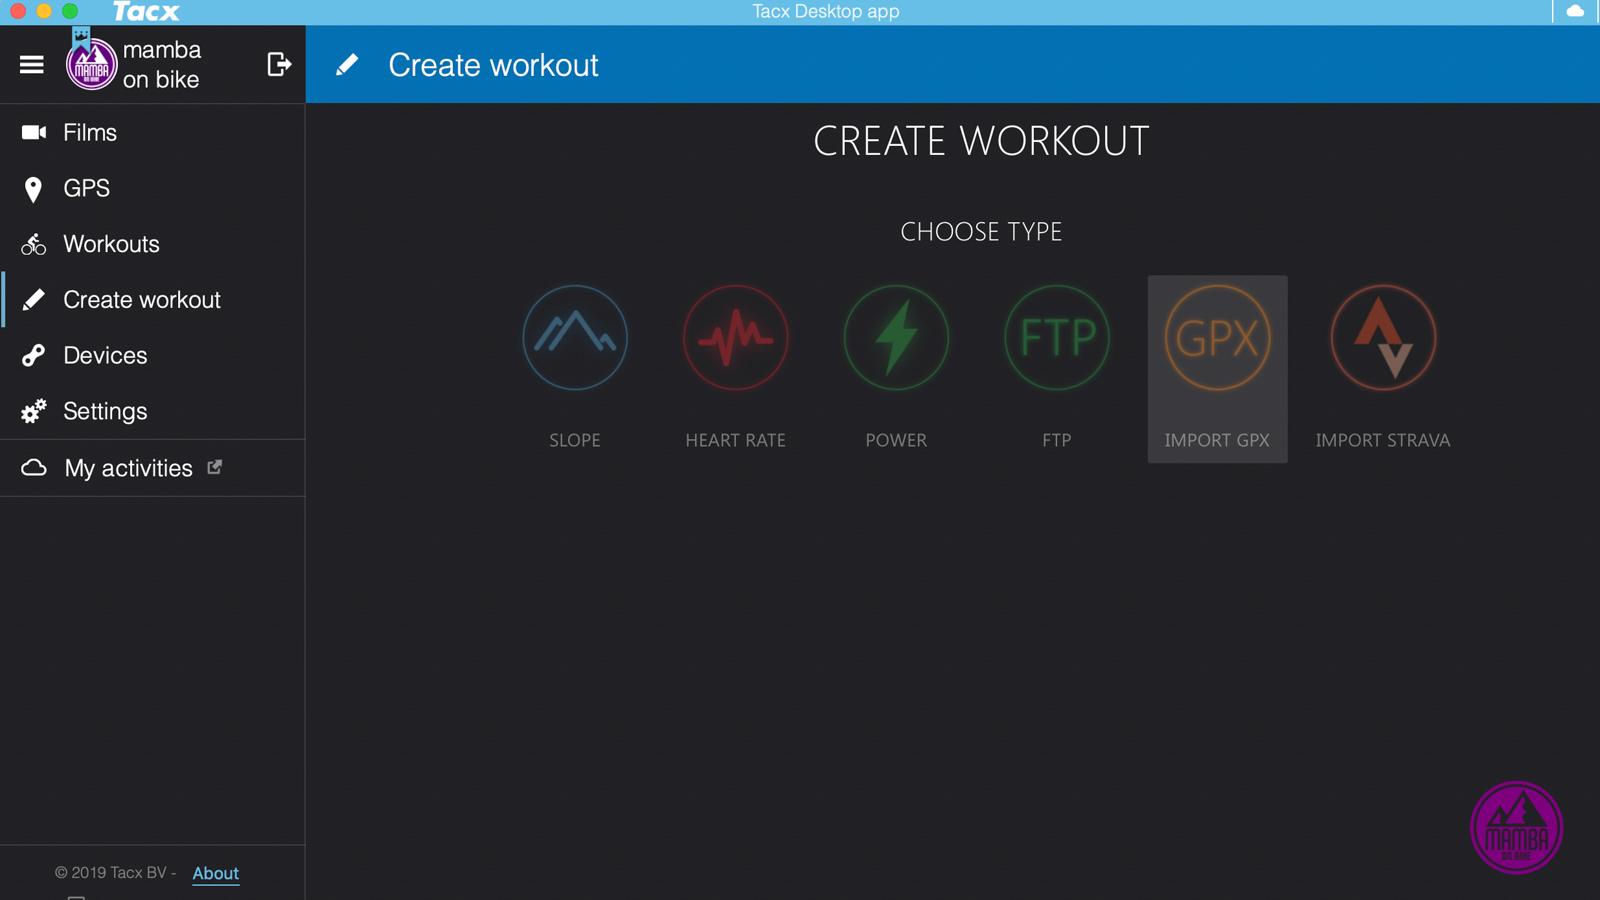 Tacx Desktop App - import gpx